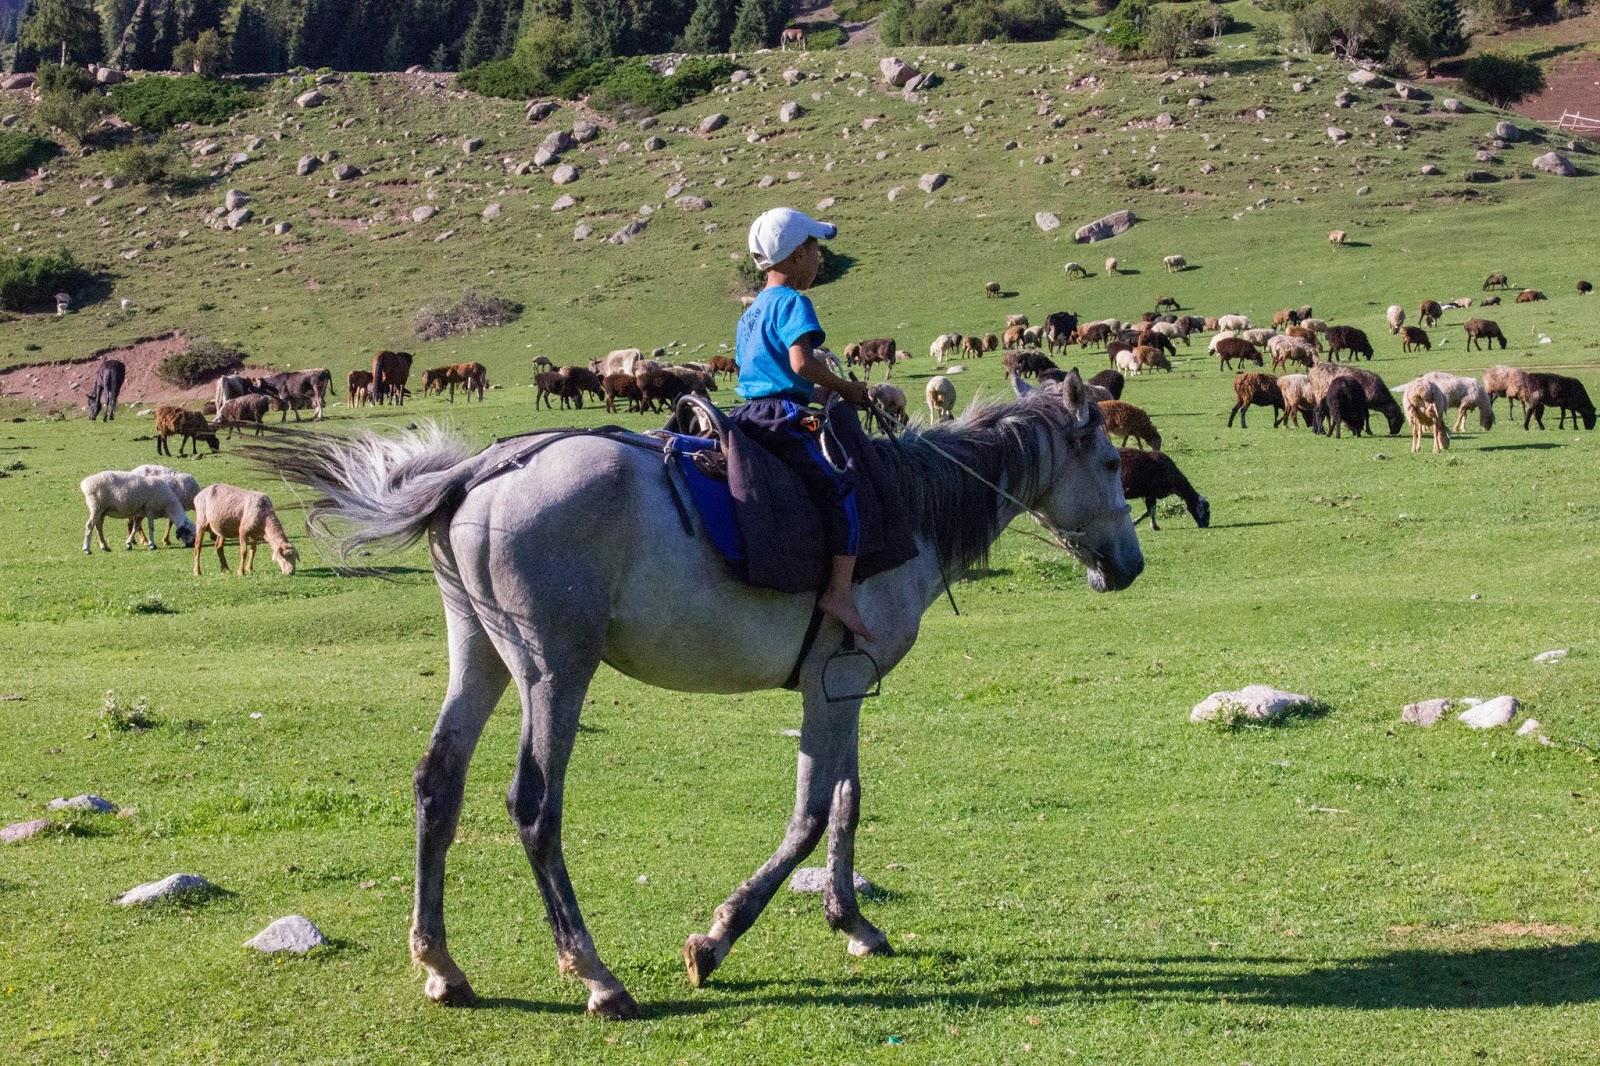 Кыргызстан, Джеты-Огуз, Иссык-Куль, горы, лошадь